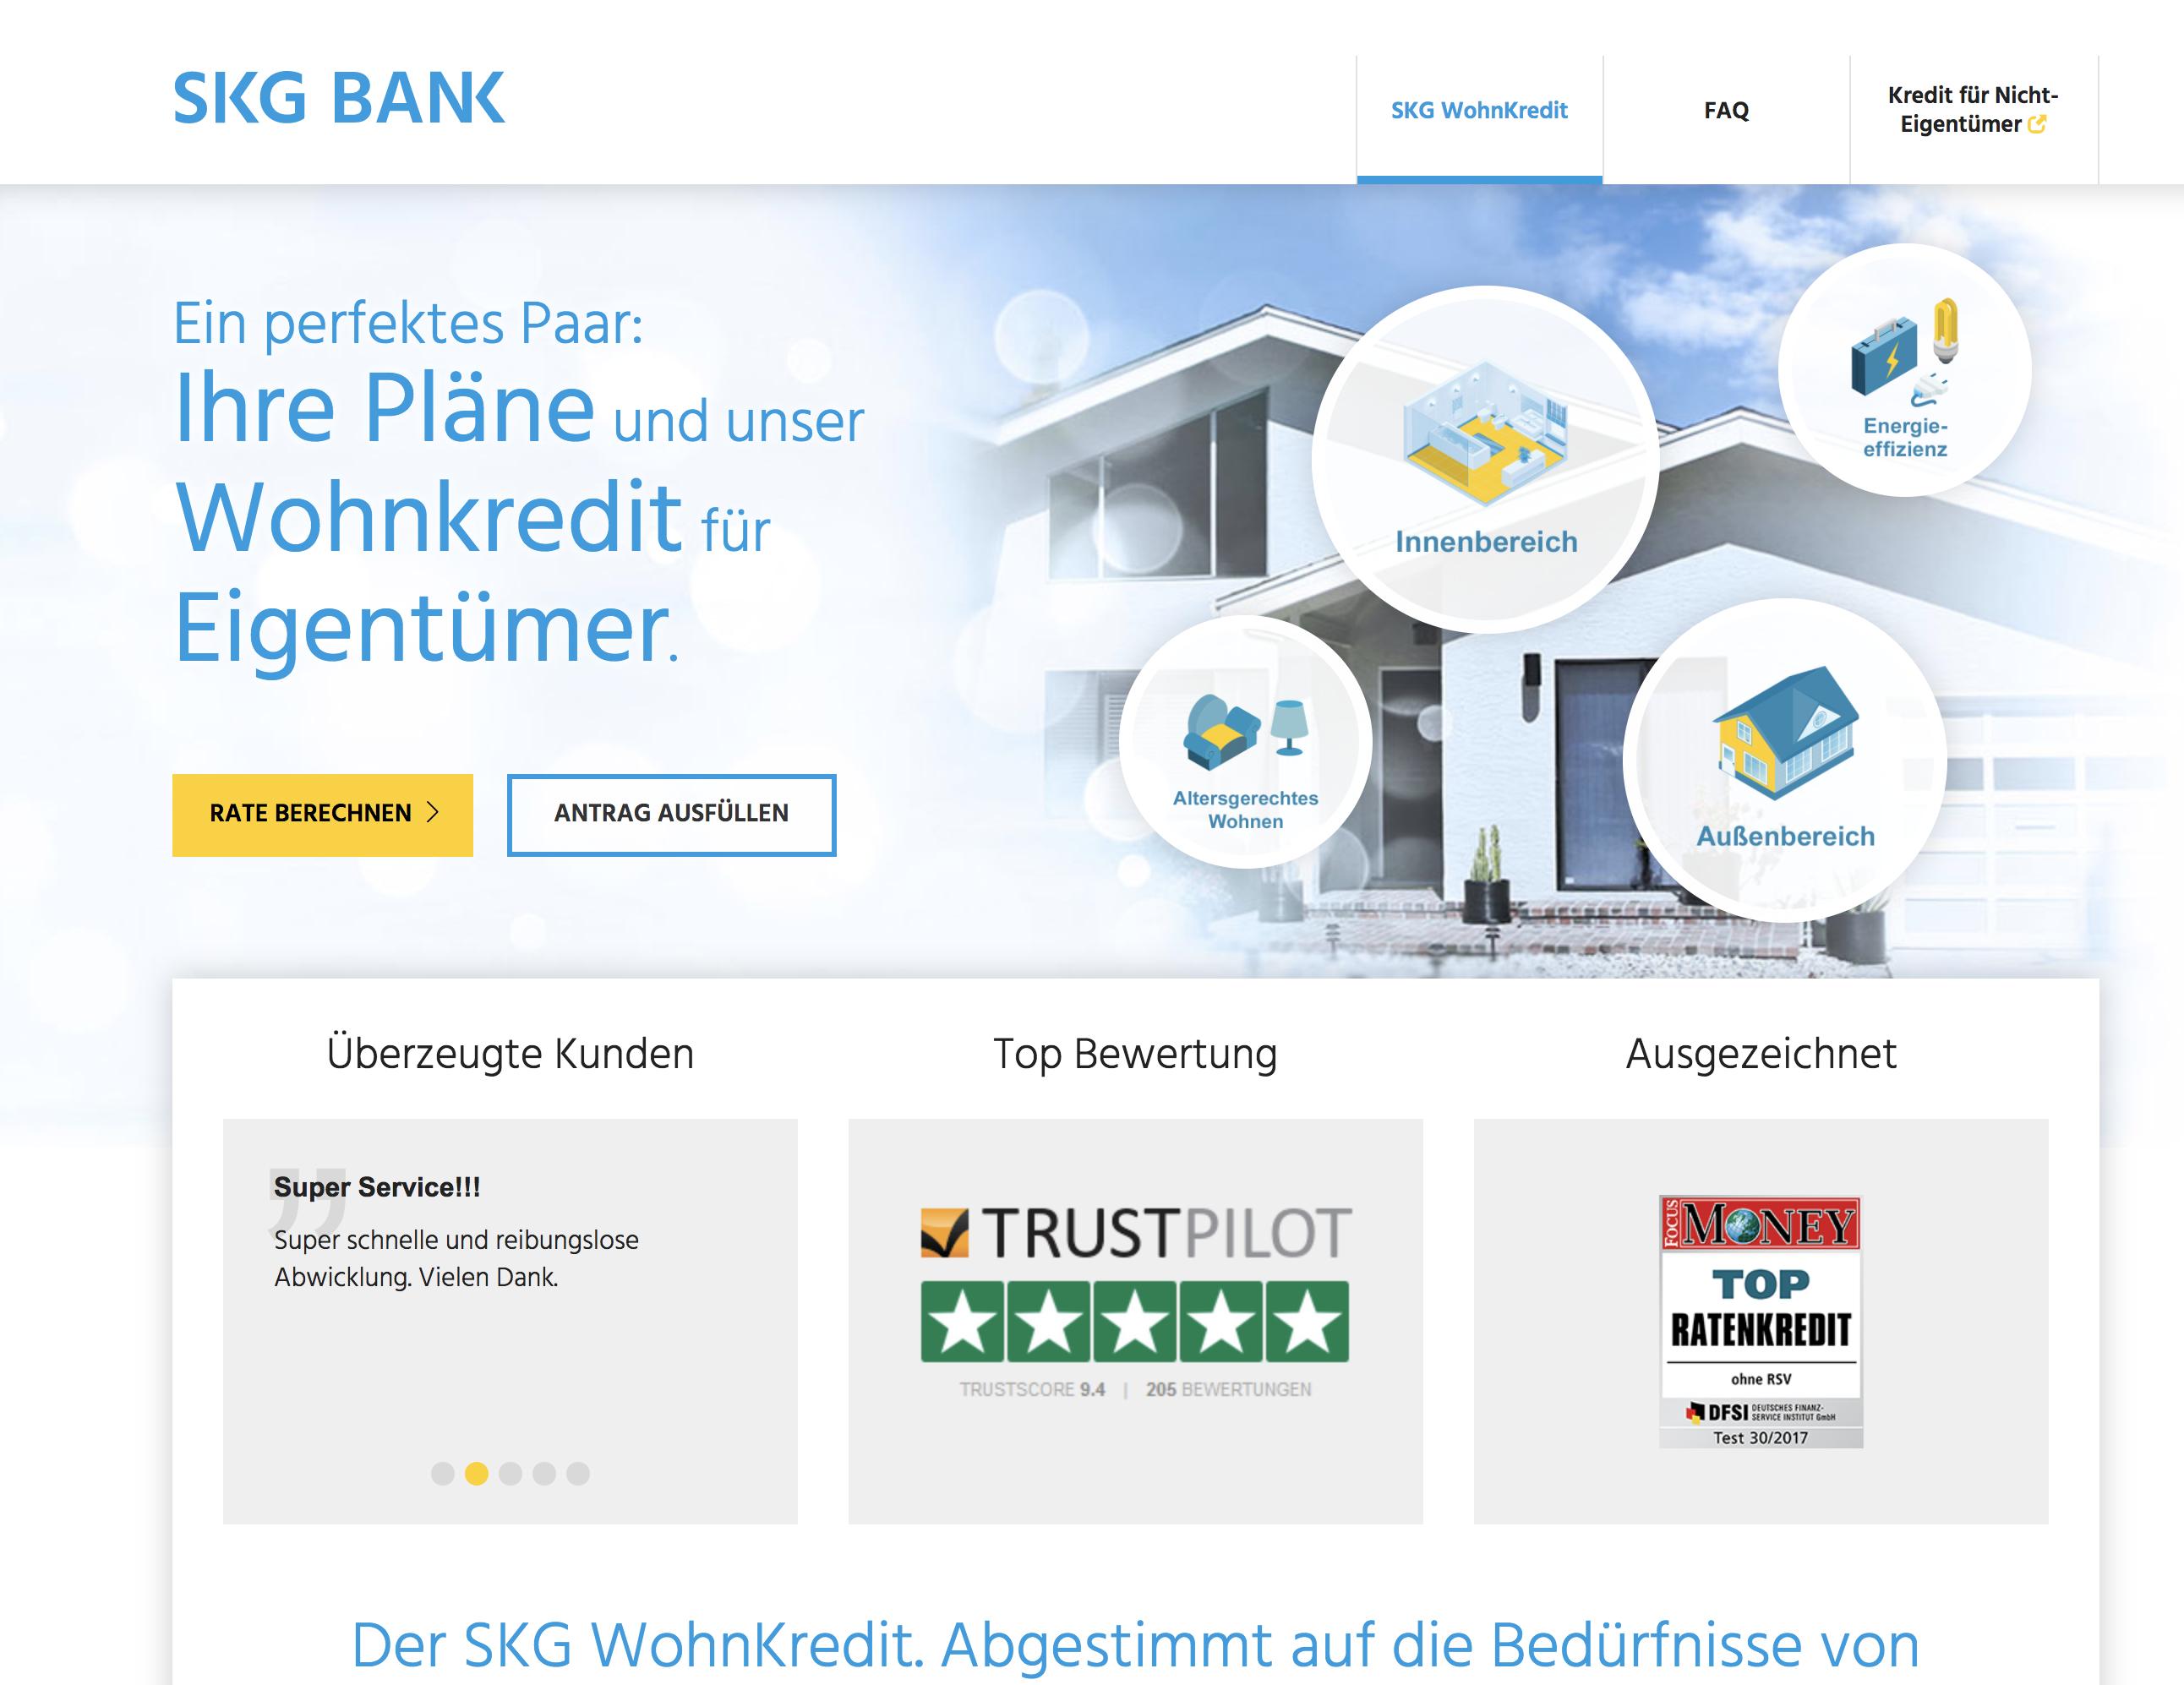 skg Bank wohnkredit